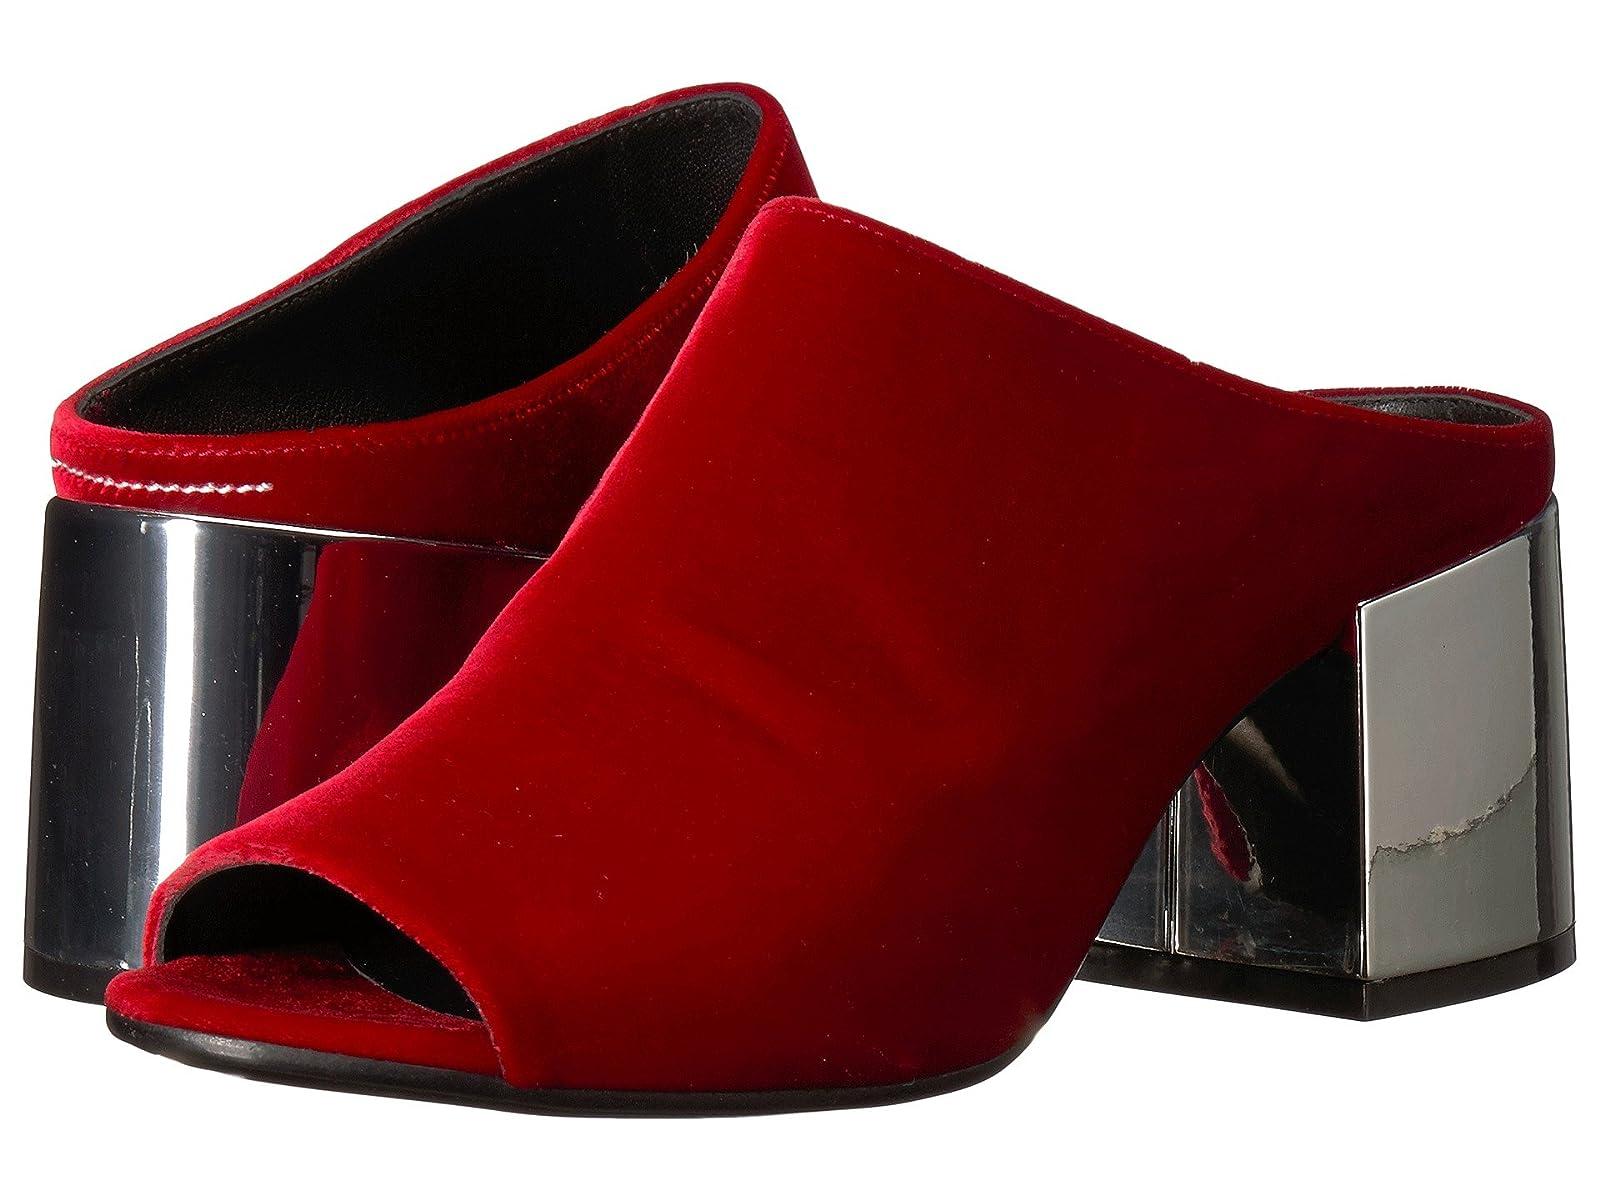 MM6 Maison Margiela Velvet MuleAtmospheric grades have affordable shoes